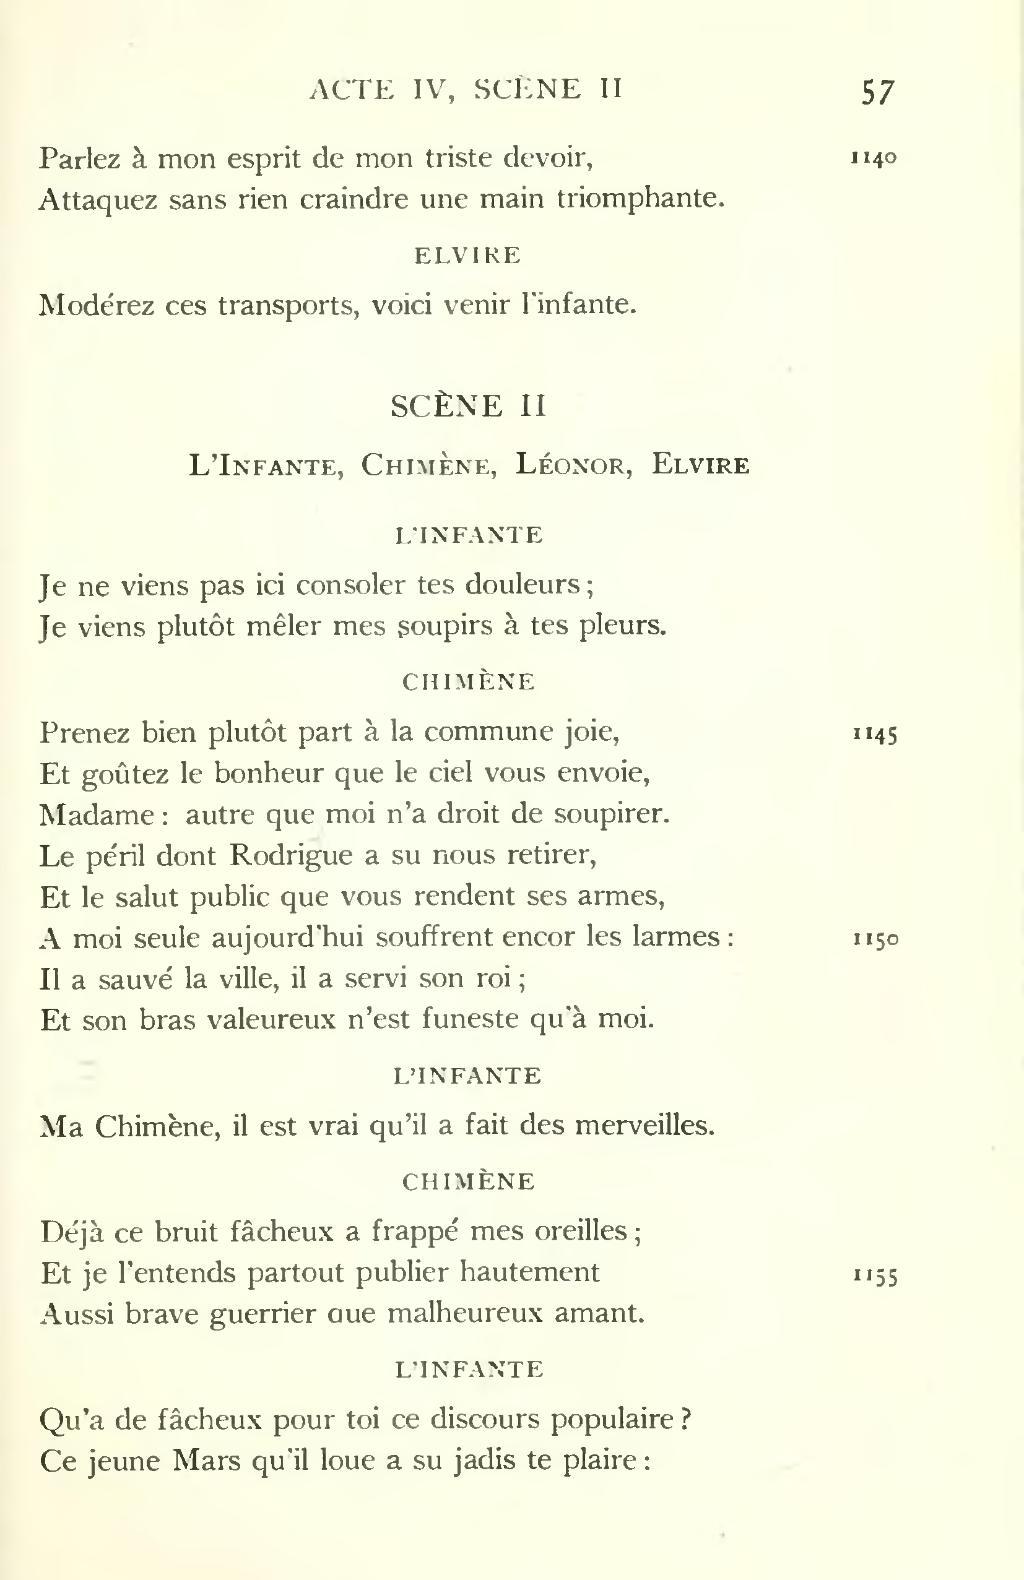 Le Cid Acte 2 Scene 2 : scene, Page:Corneille, Searles,, 1912.djvu/91, Wikisource